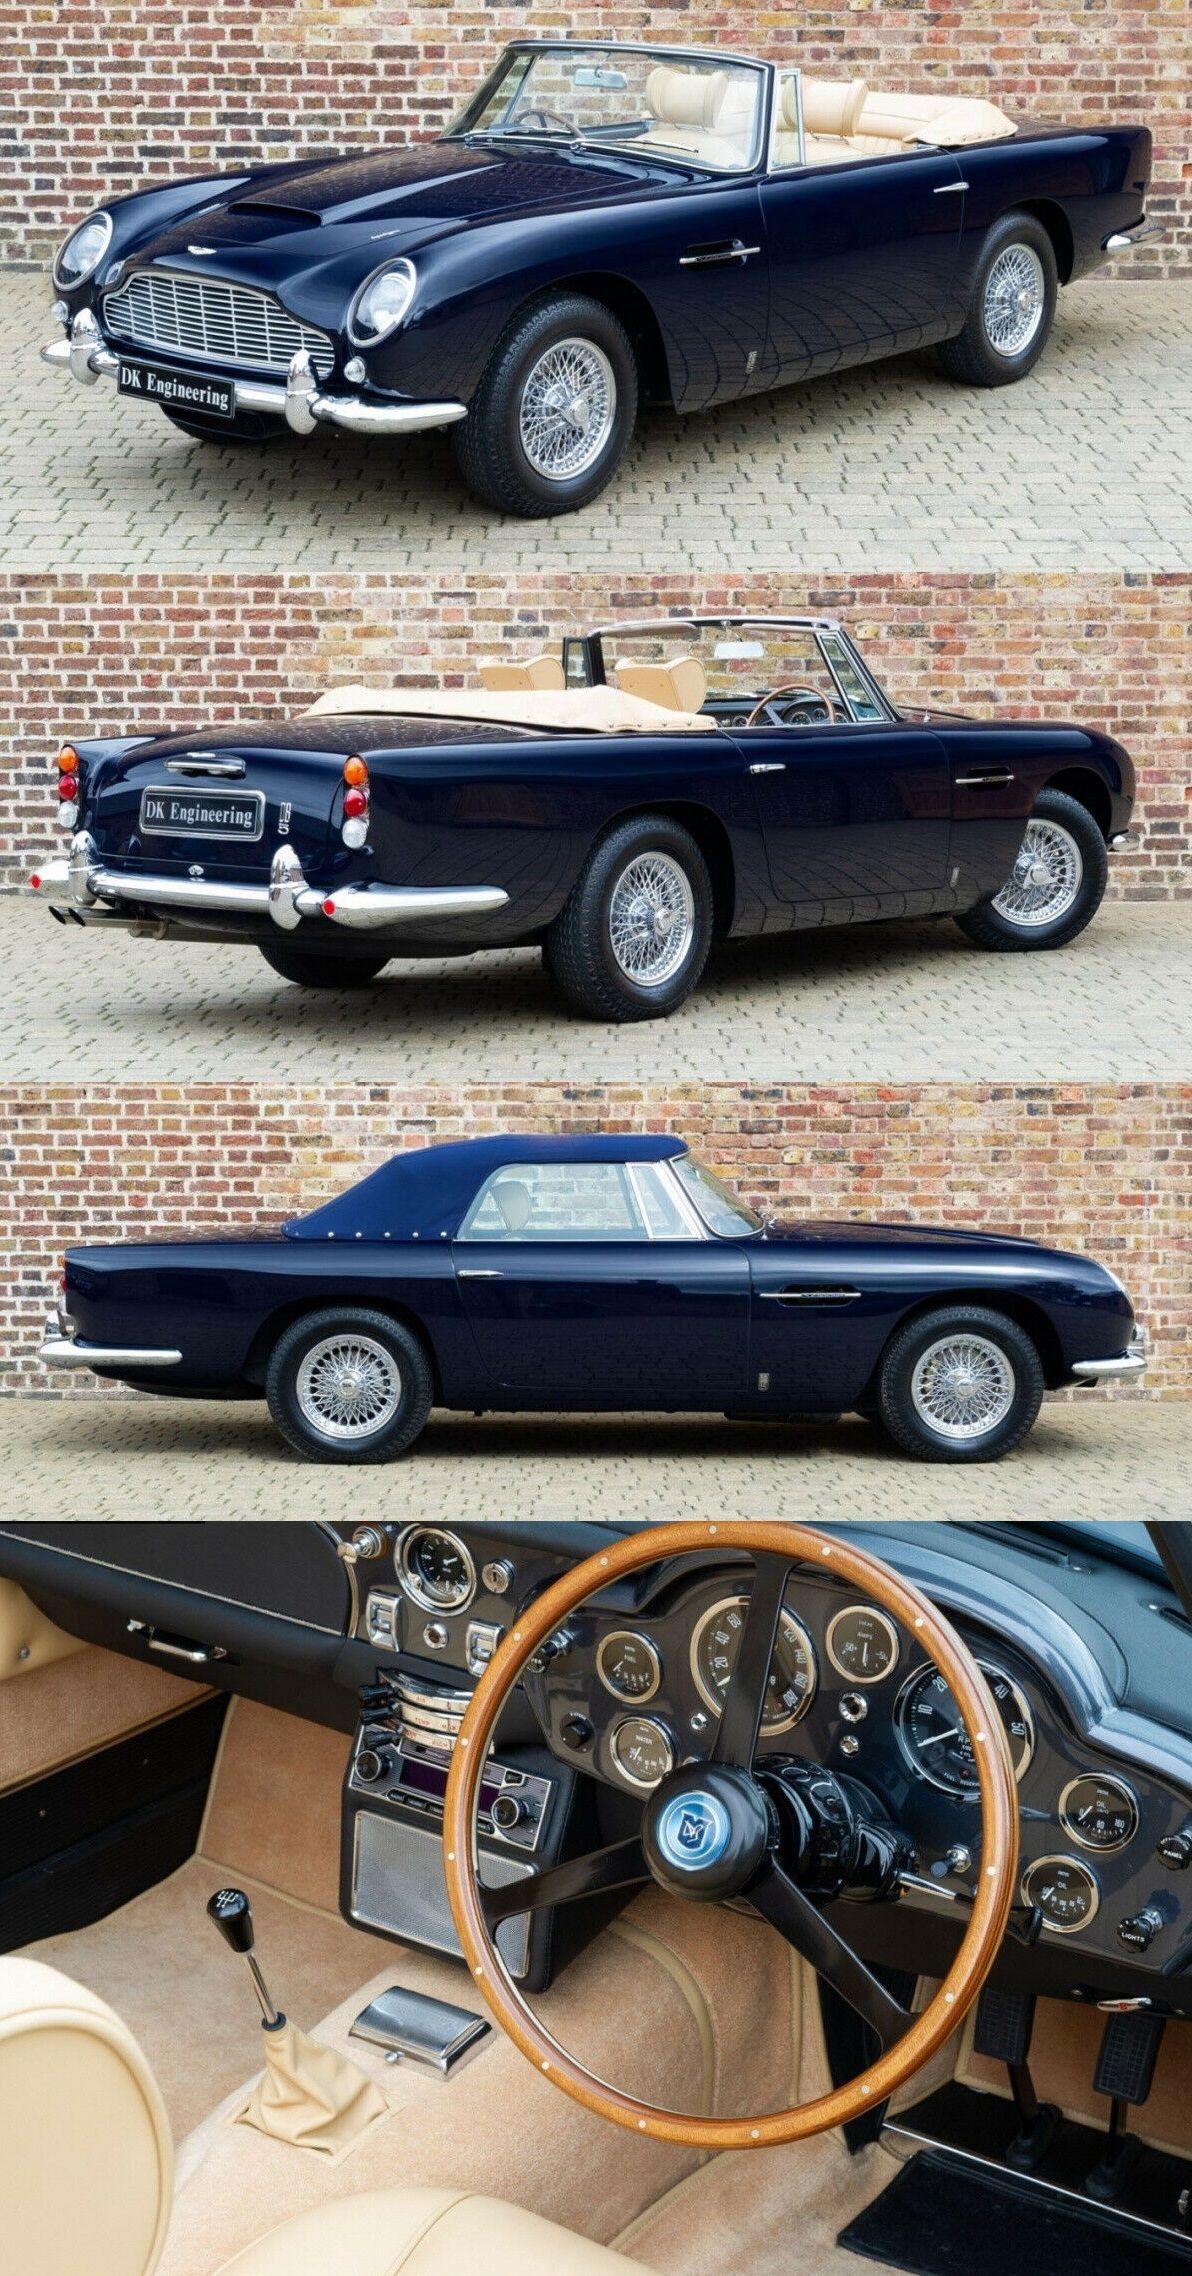 1965 Aston Martin DB5 Aston martin, Aston martin db5